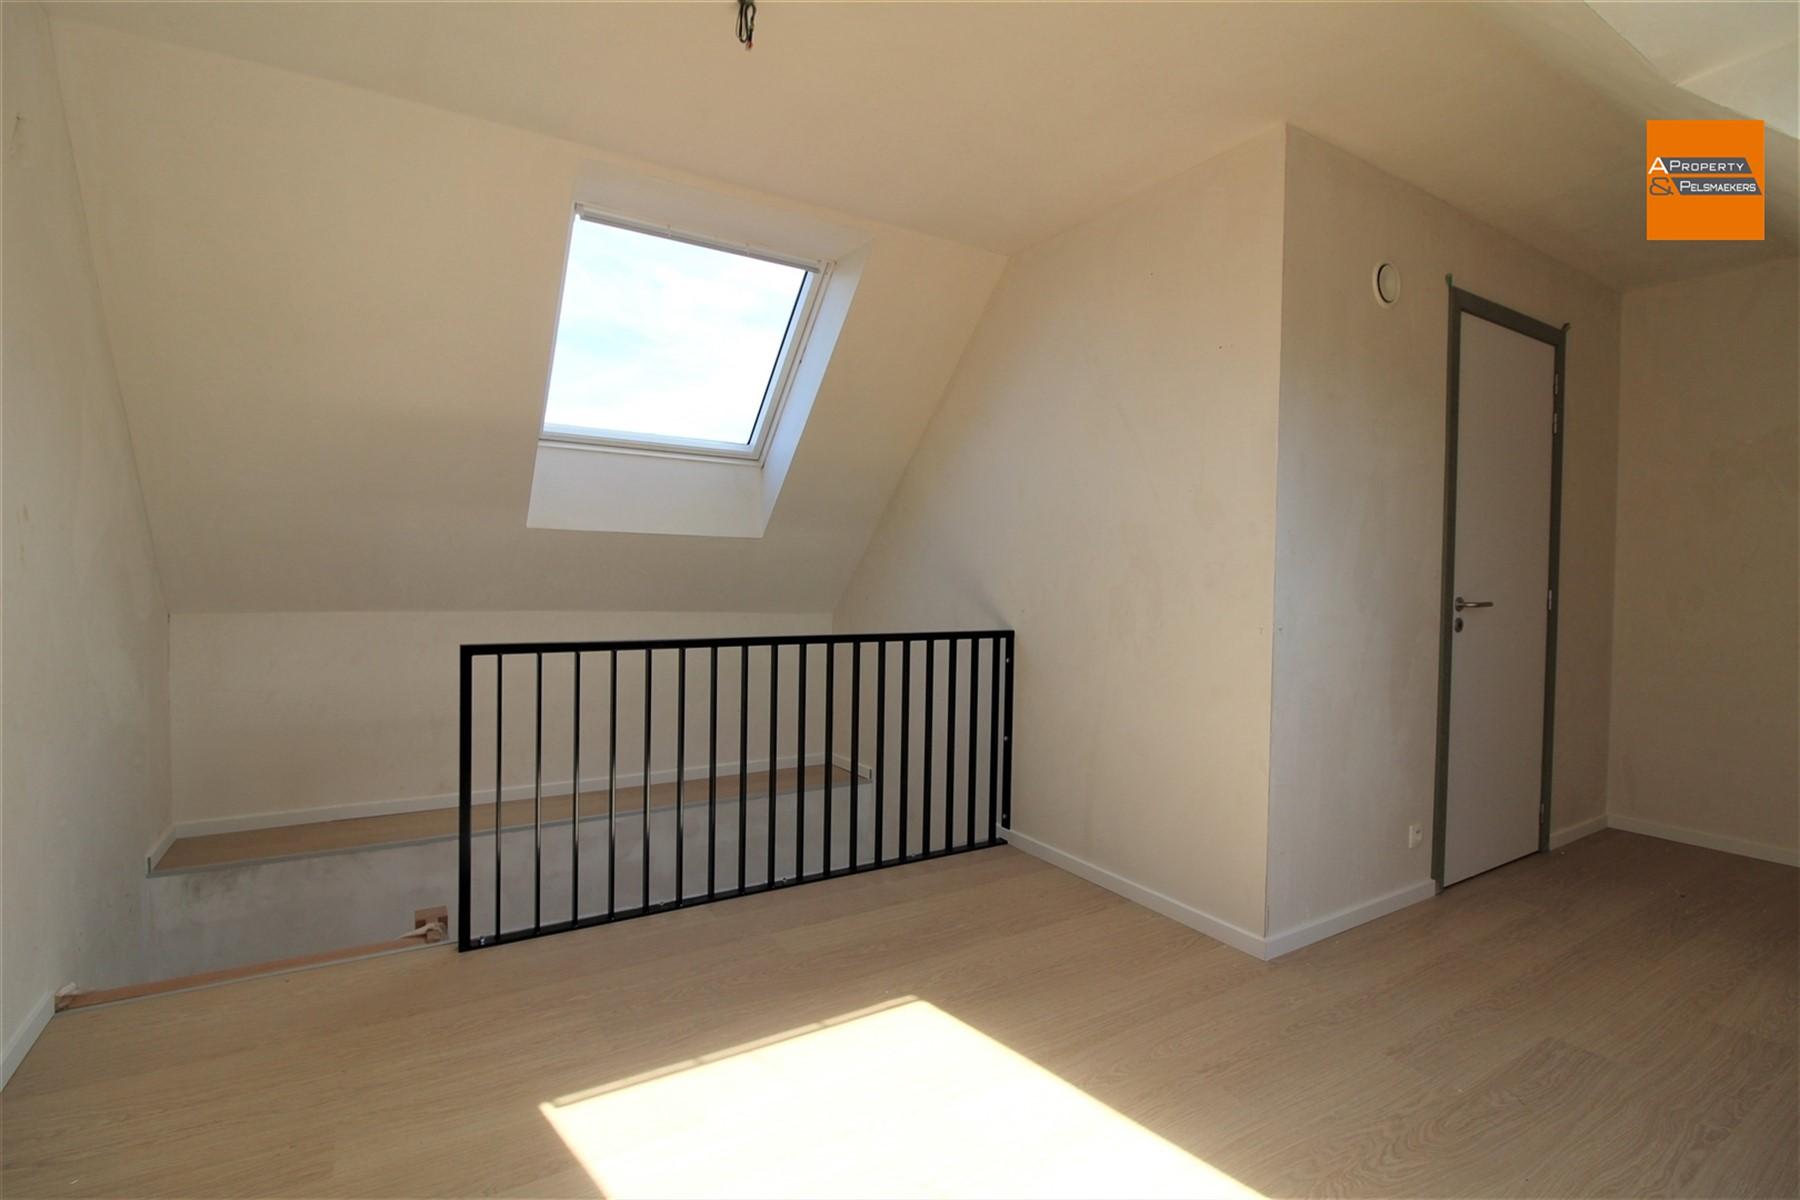 Foto 19 : Appartement in 3060 BERTEM (België) - Prijs € 319.000